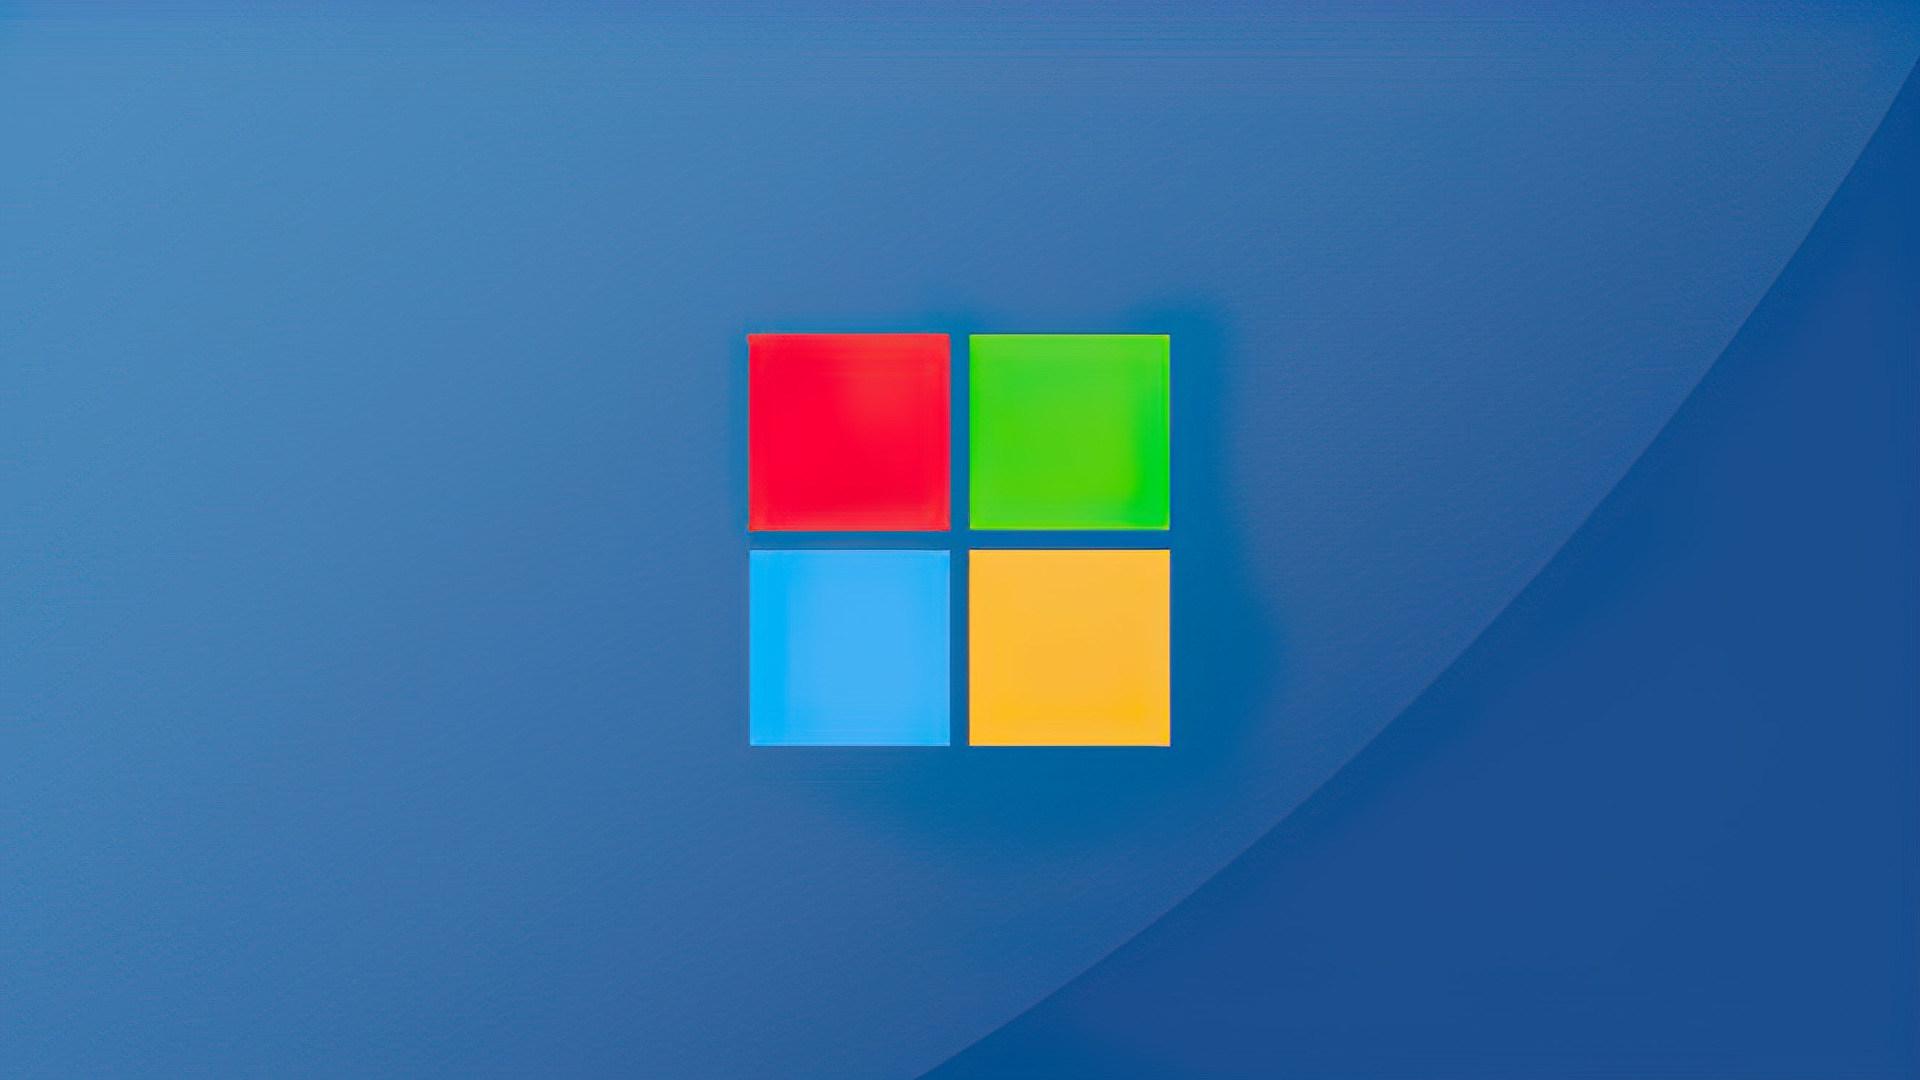 Microsoft, Betriebssystem, Windows 10, Windows, Logo, Microsoft Corporation, Windows Logo, Windows 10 Logo